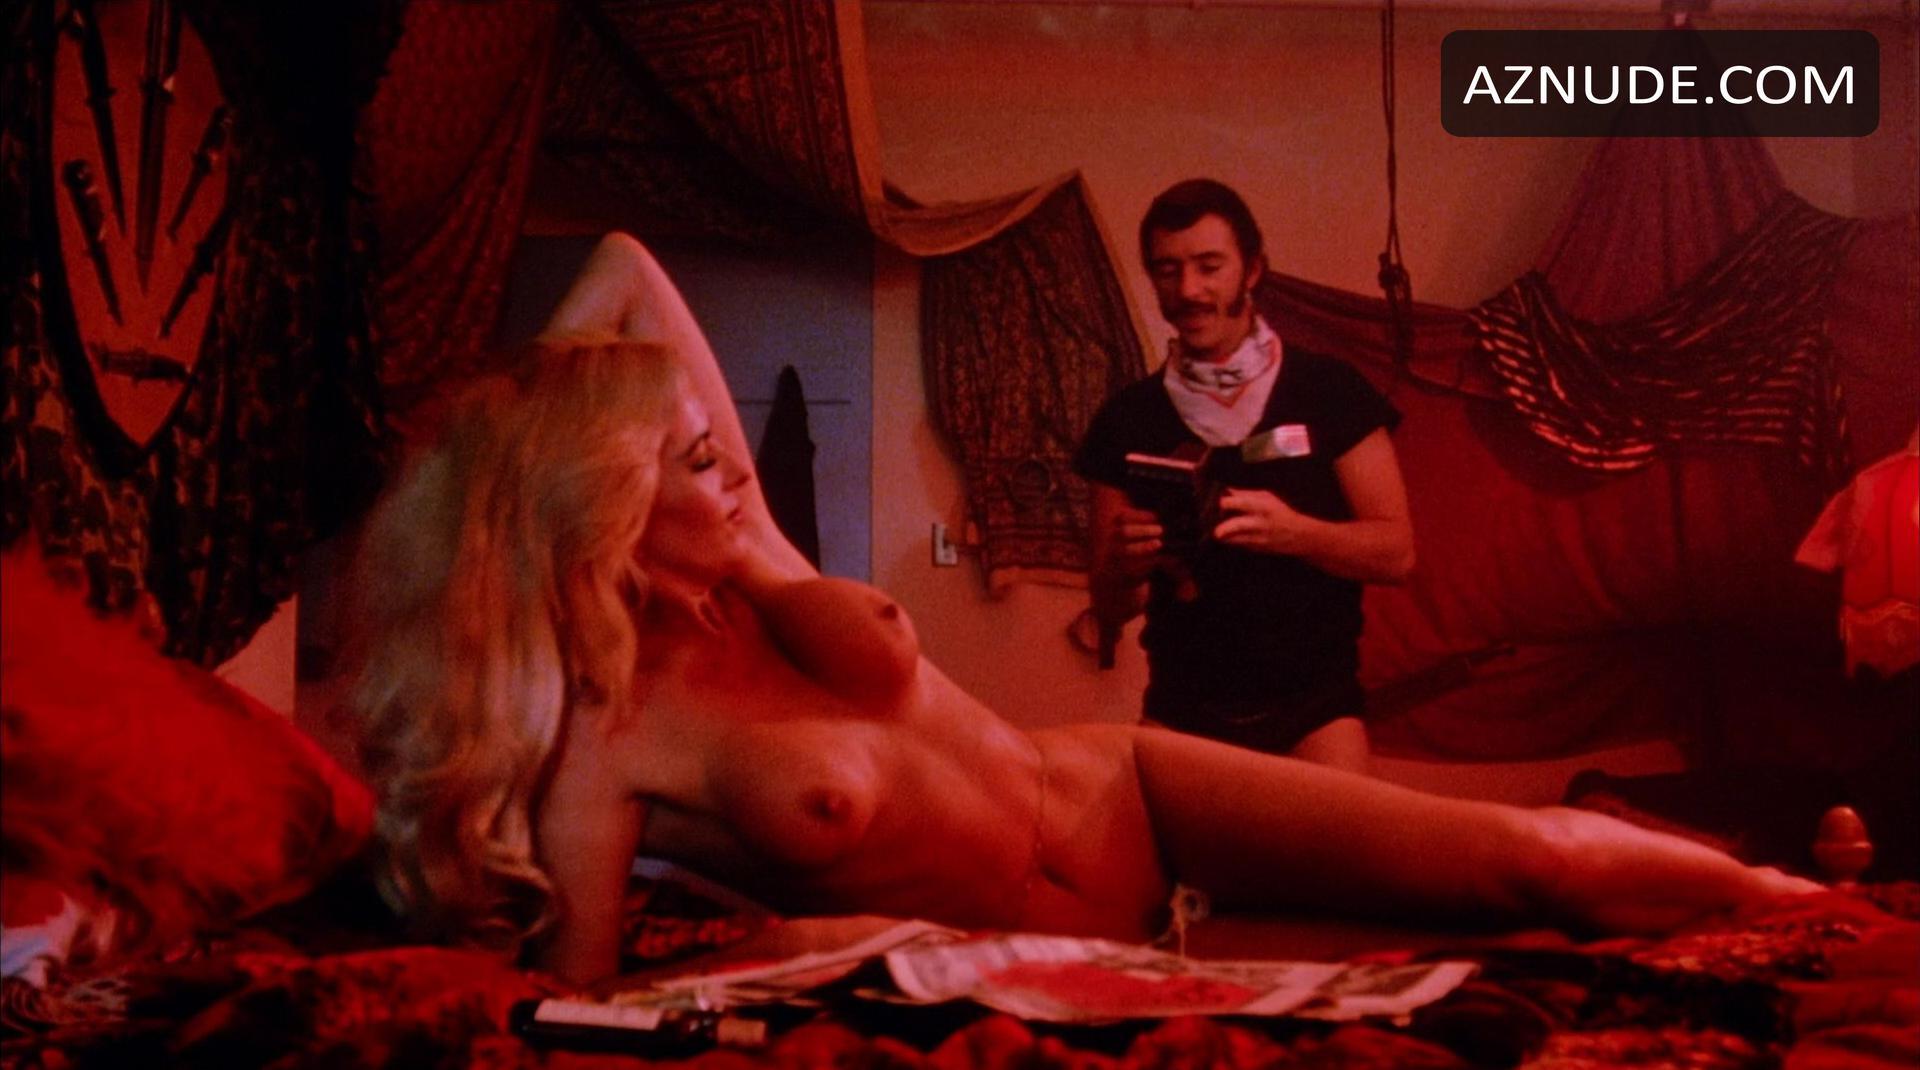 Sex from i peccati di una casalinga 1999 angelica bella - 2 part 7